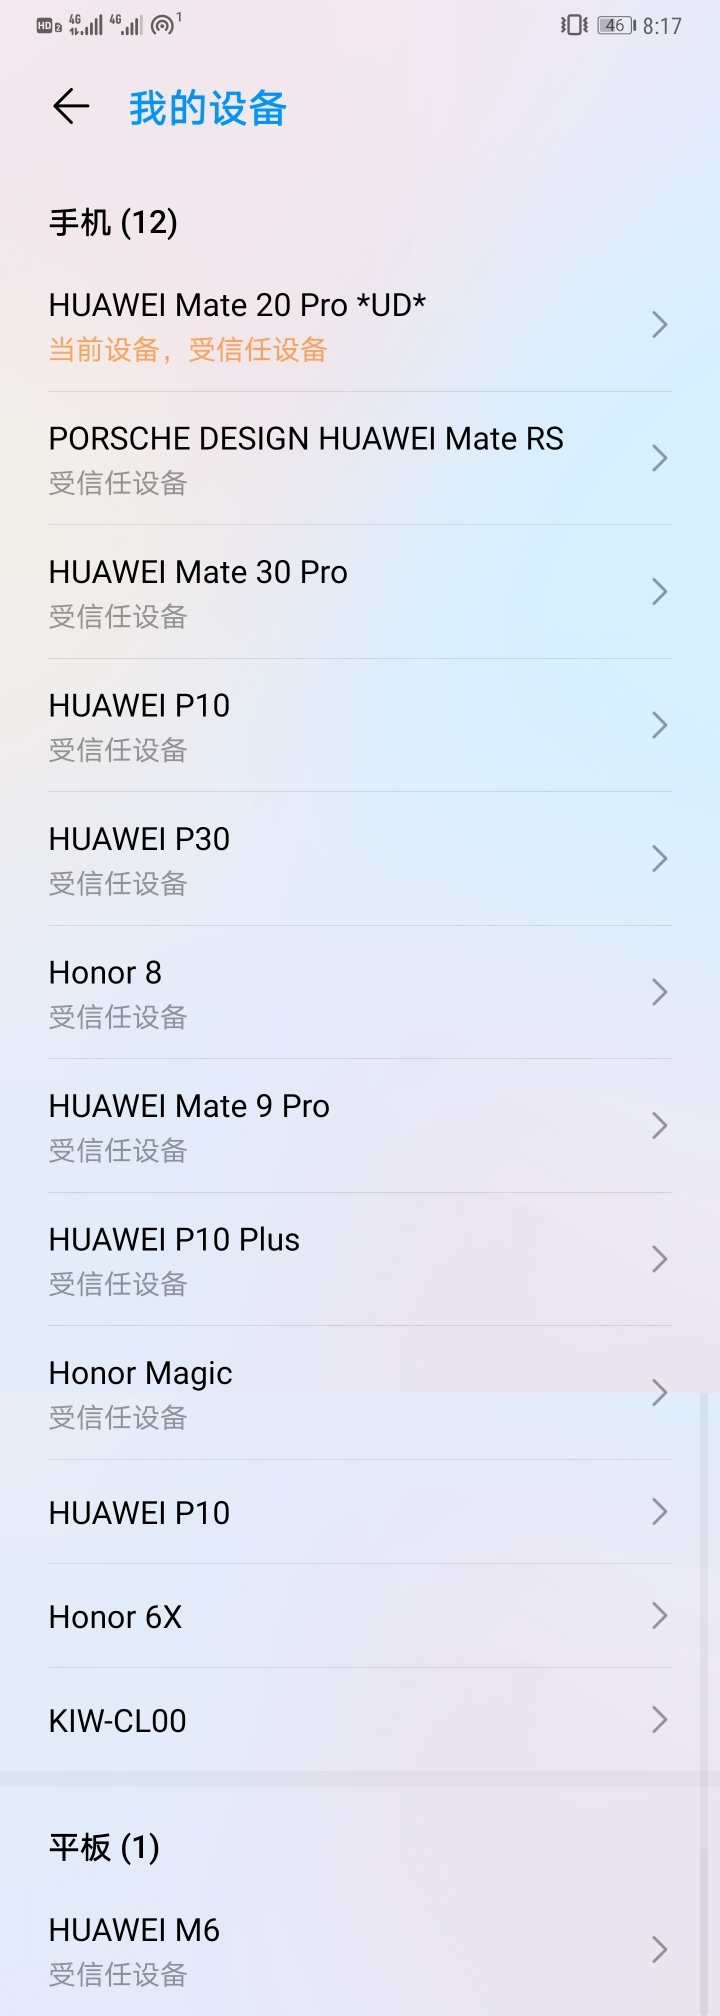 Screenshot_20191021_201727_com.huawei.hwid.jpg